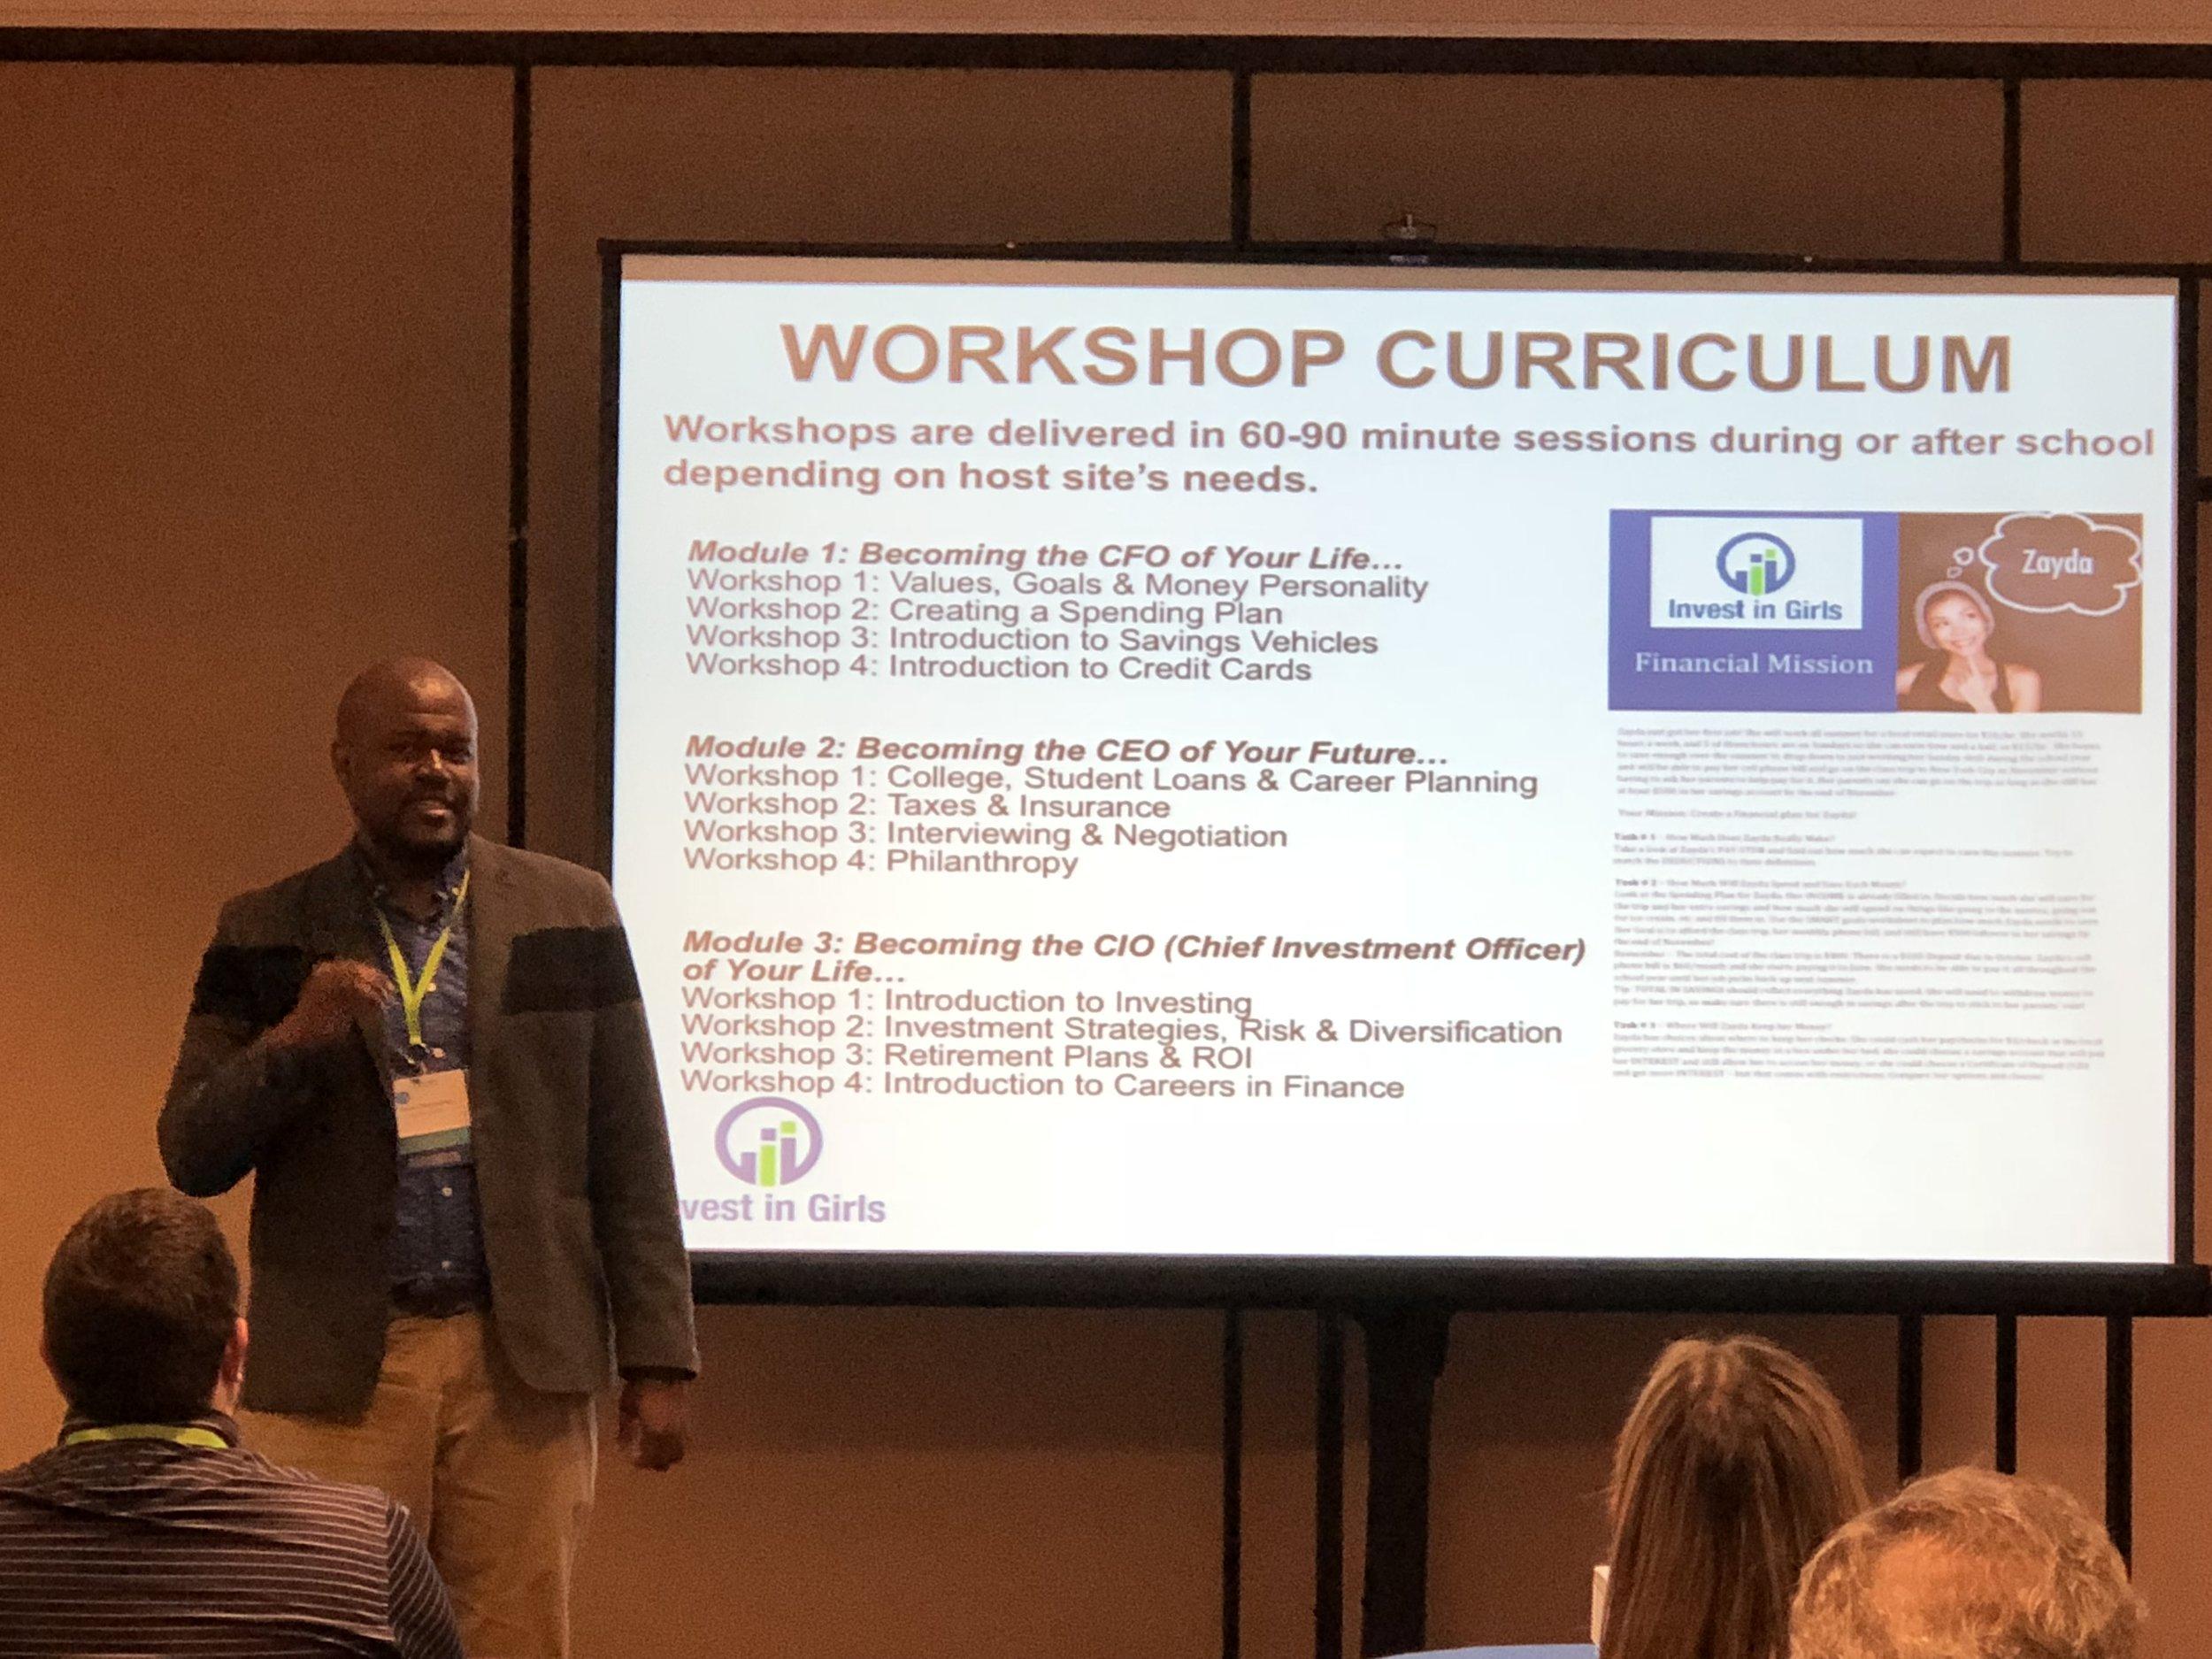 Director of Technology & New York City Programs Devon Mercurius breaks down our curriculum.